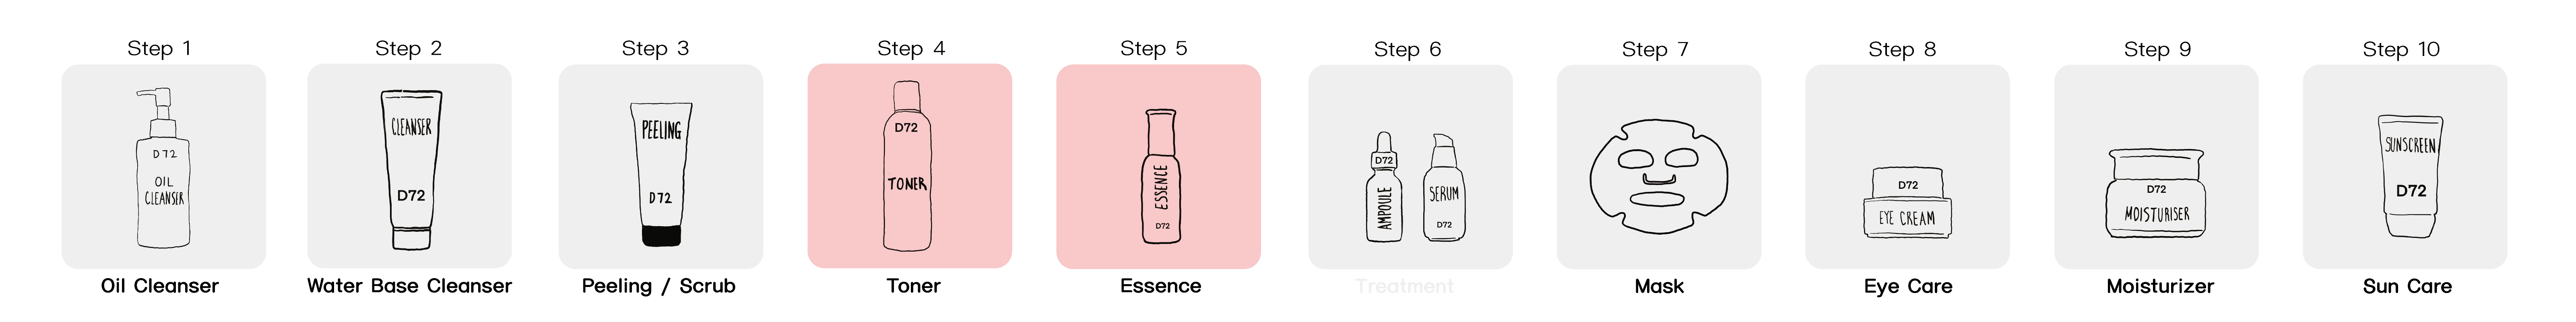 step-4-5-toner-essence.jpg